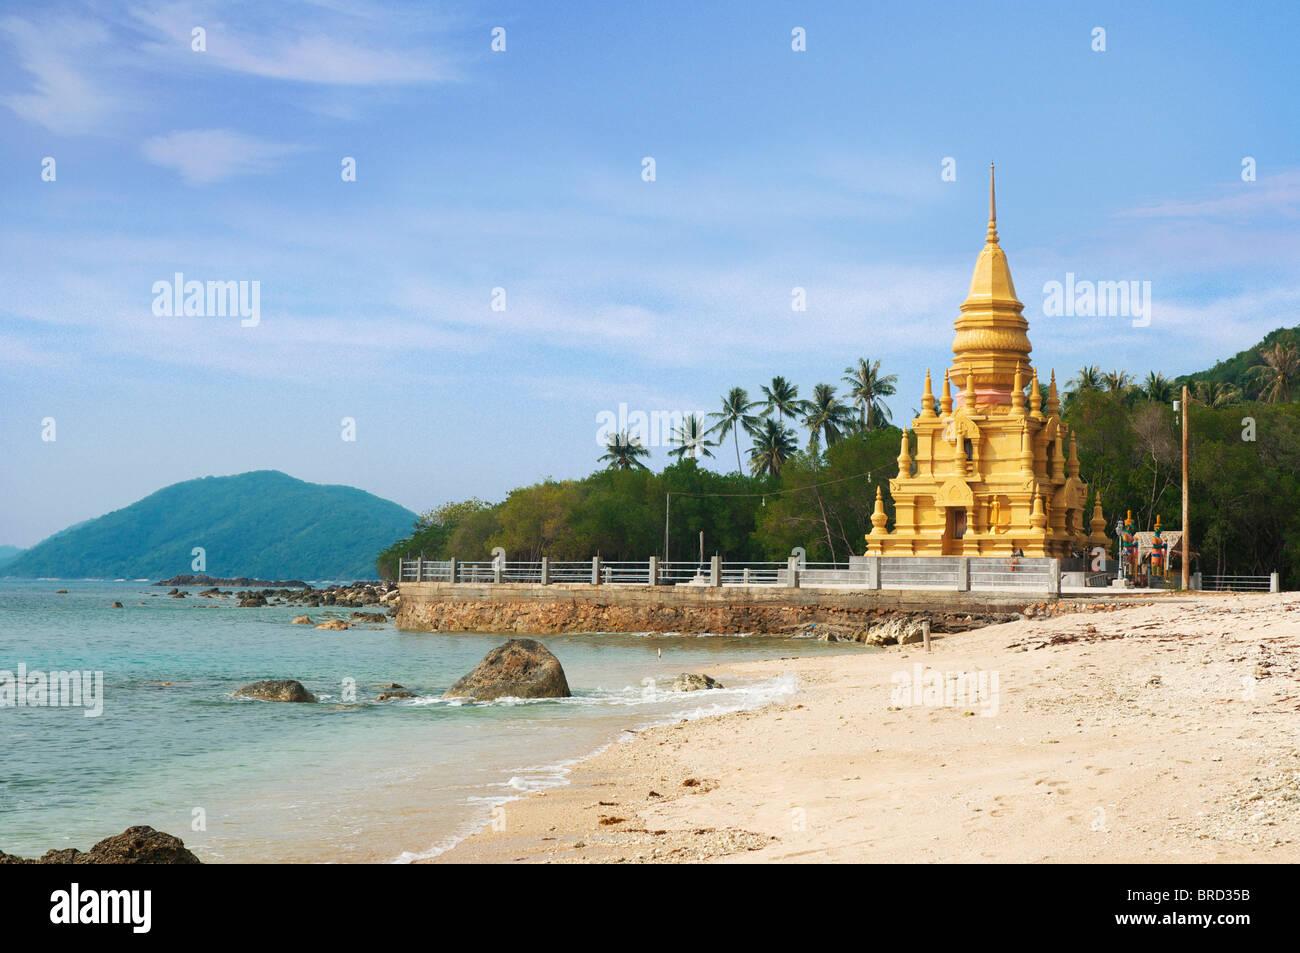 Laem Sor Pagode, Ko Samui, Thailand - Stock Image